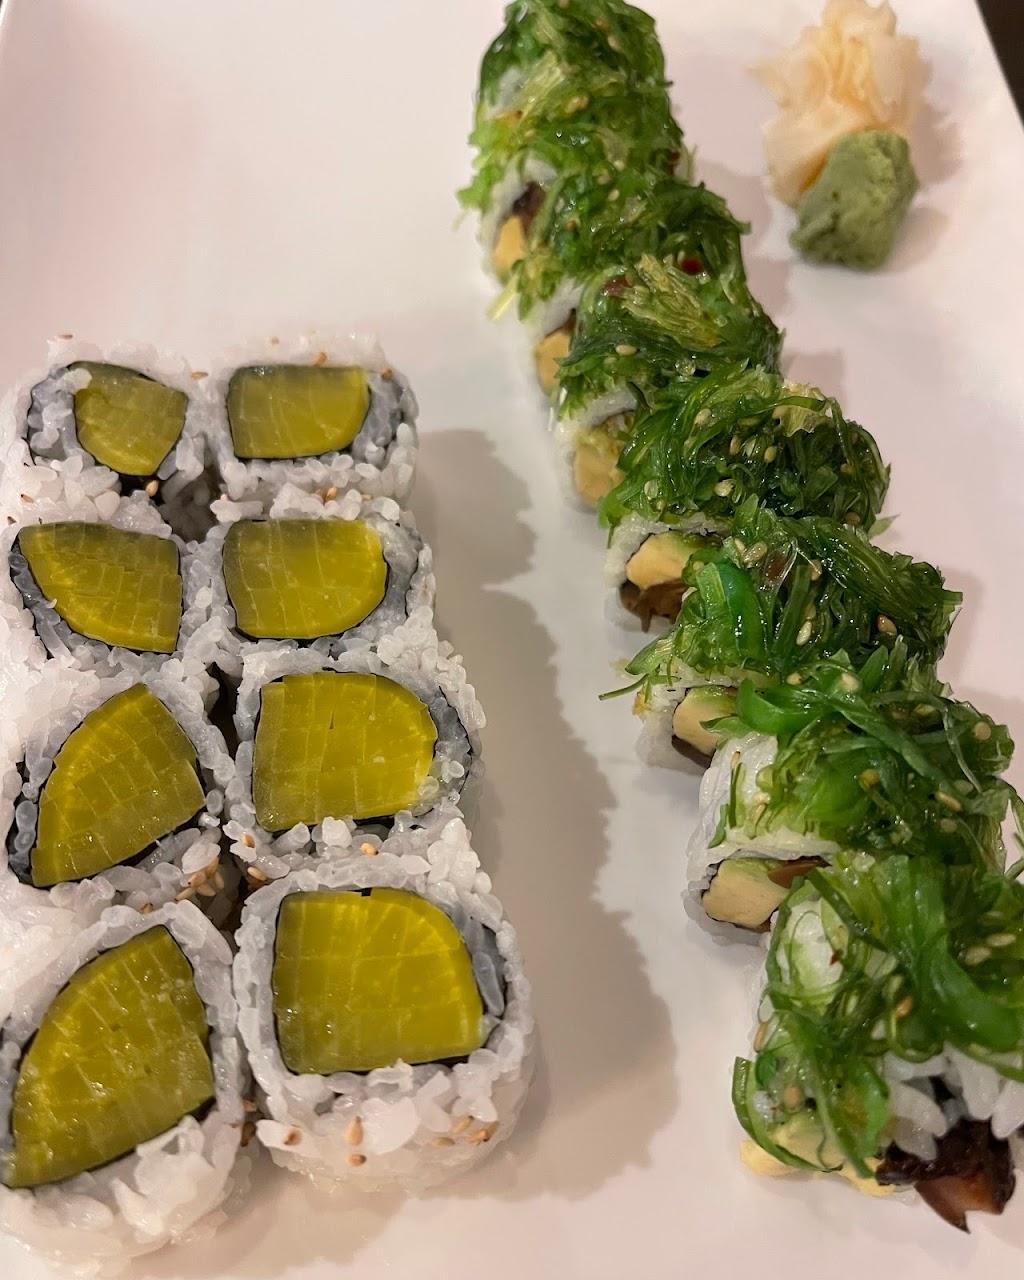 Sushi Q7 Jessup Laurel - restaurant    Photo 8 of 10   Address: 8530 Washington Blvd Unit 8&9, Jessup, MD 20794, USA   Phone: (240) 636-9909